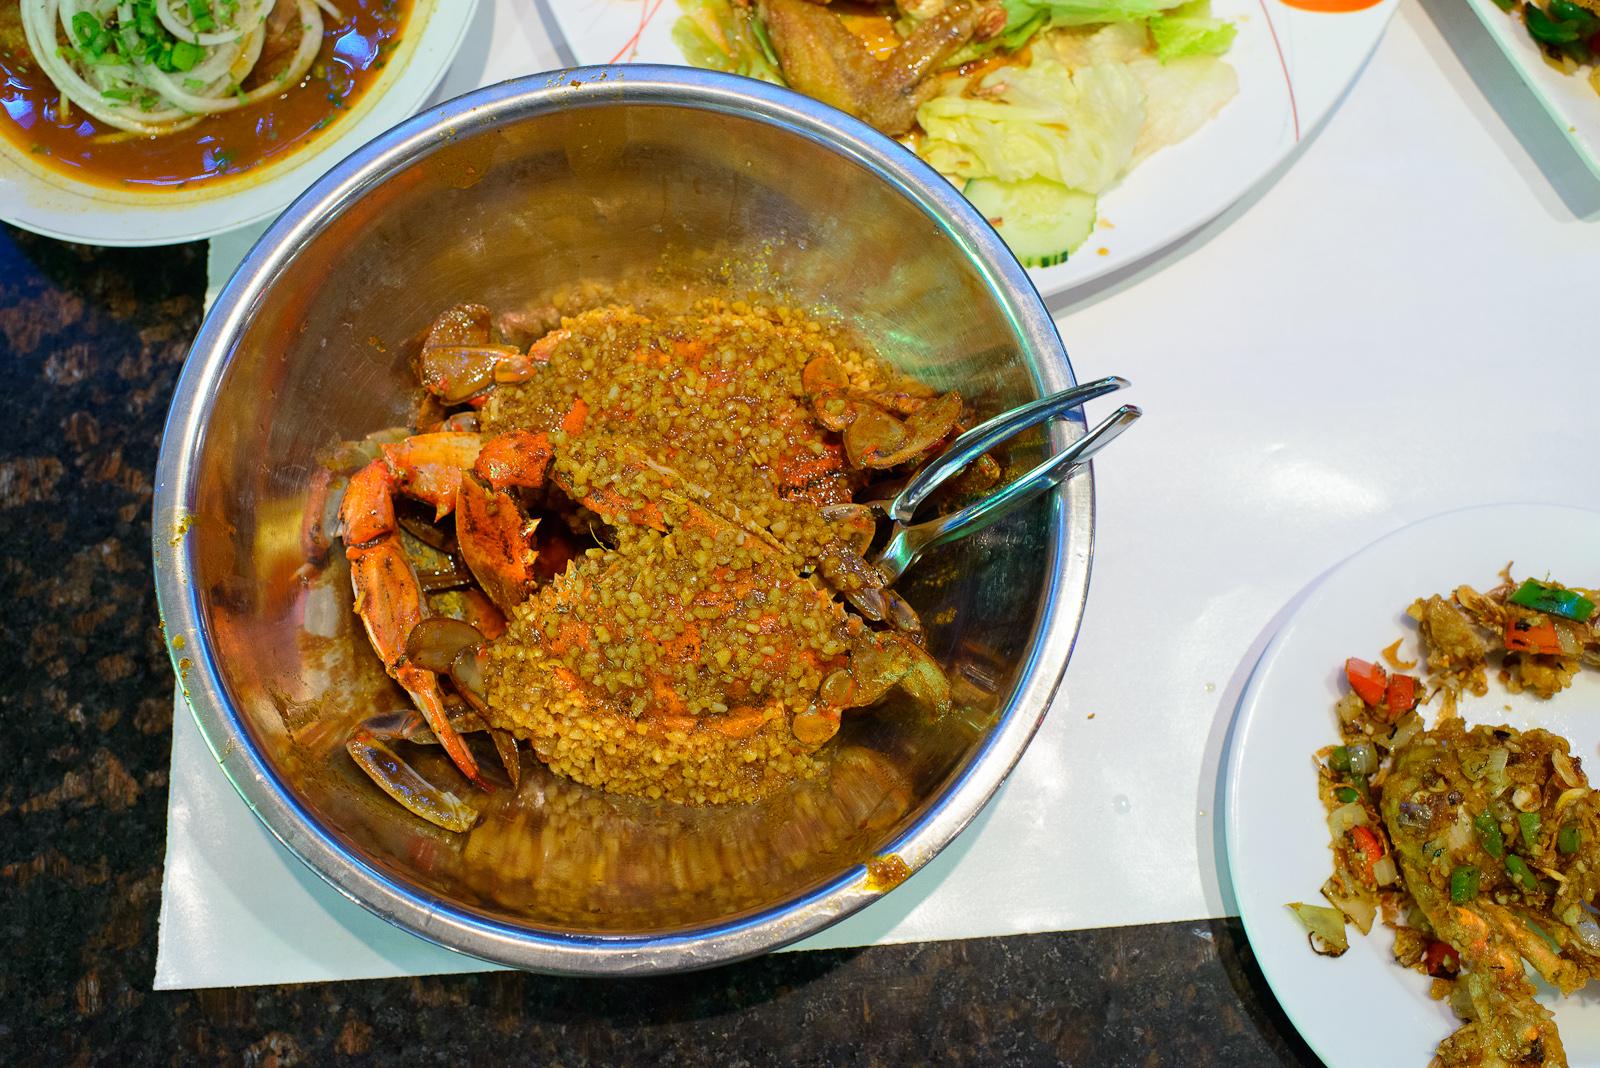 Fresh blue crab stir-fry with salt and pepper